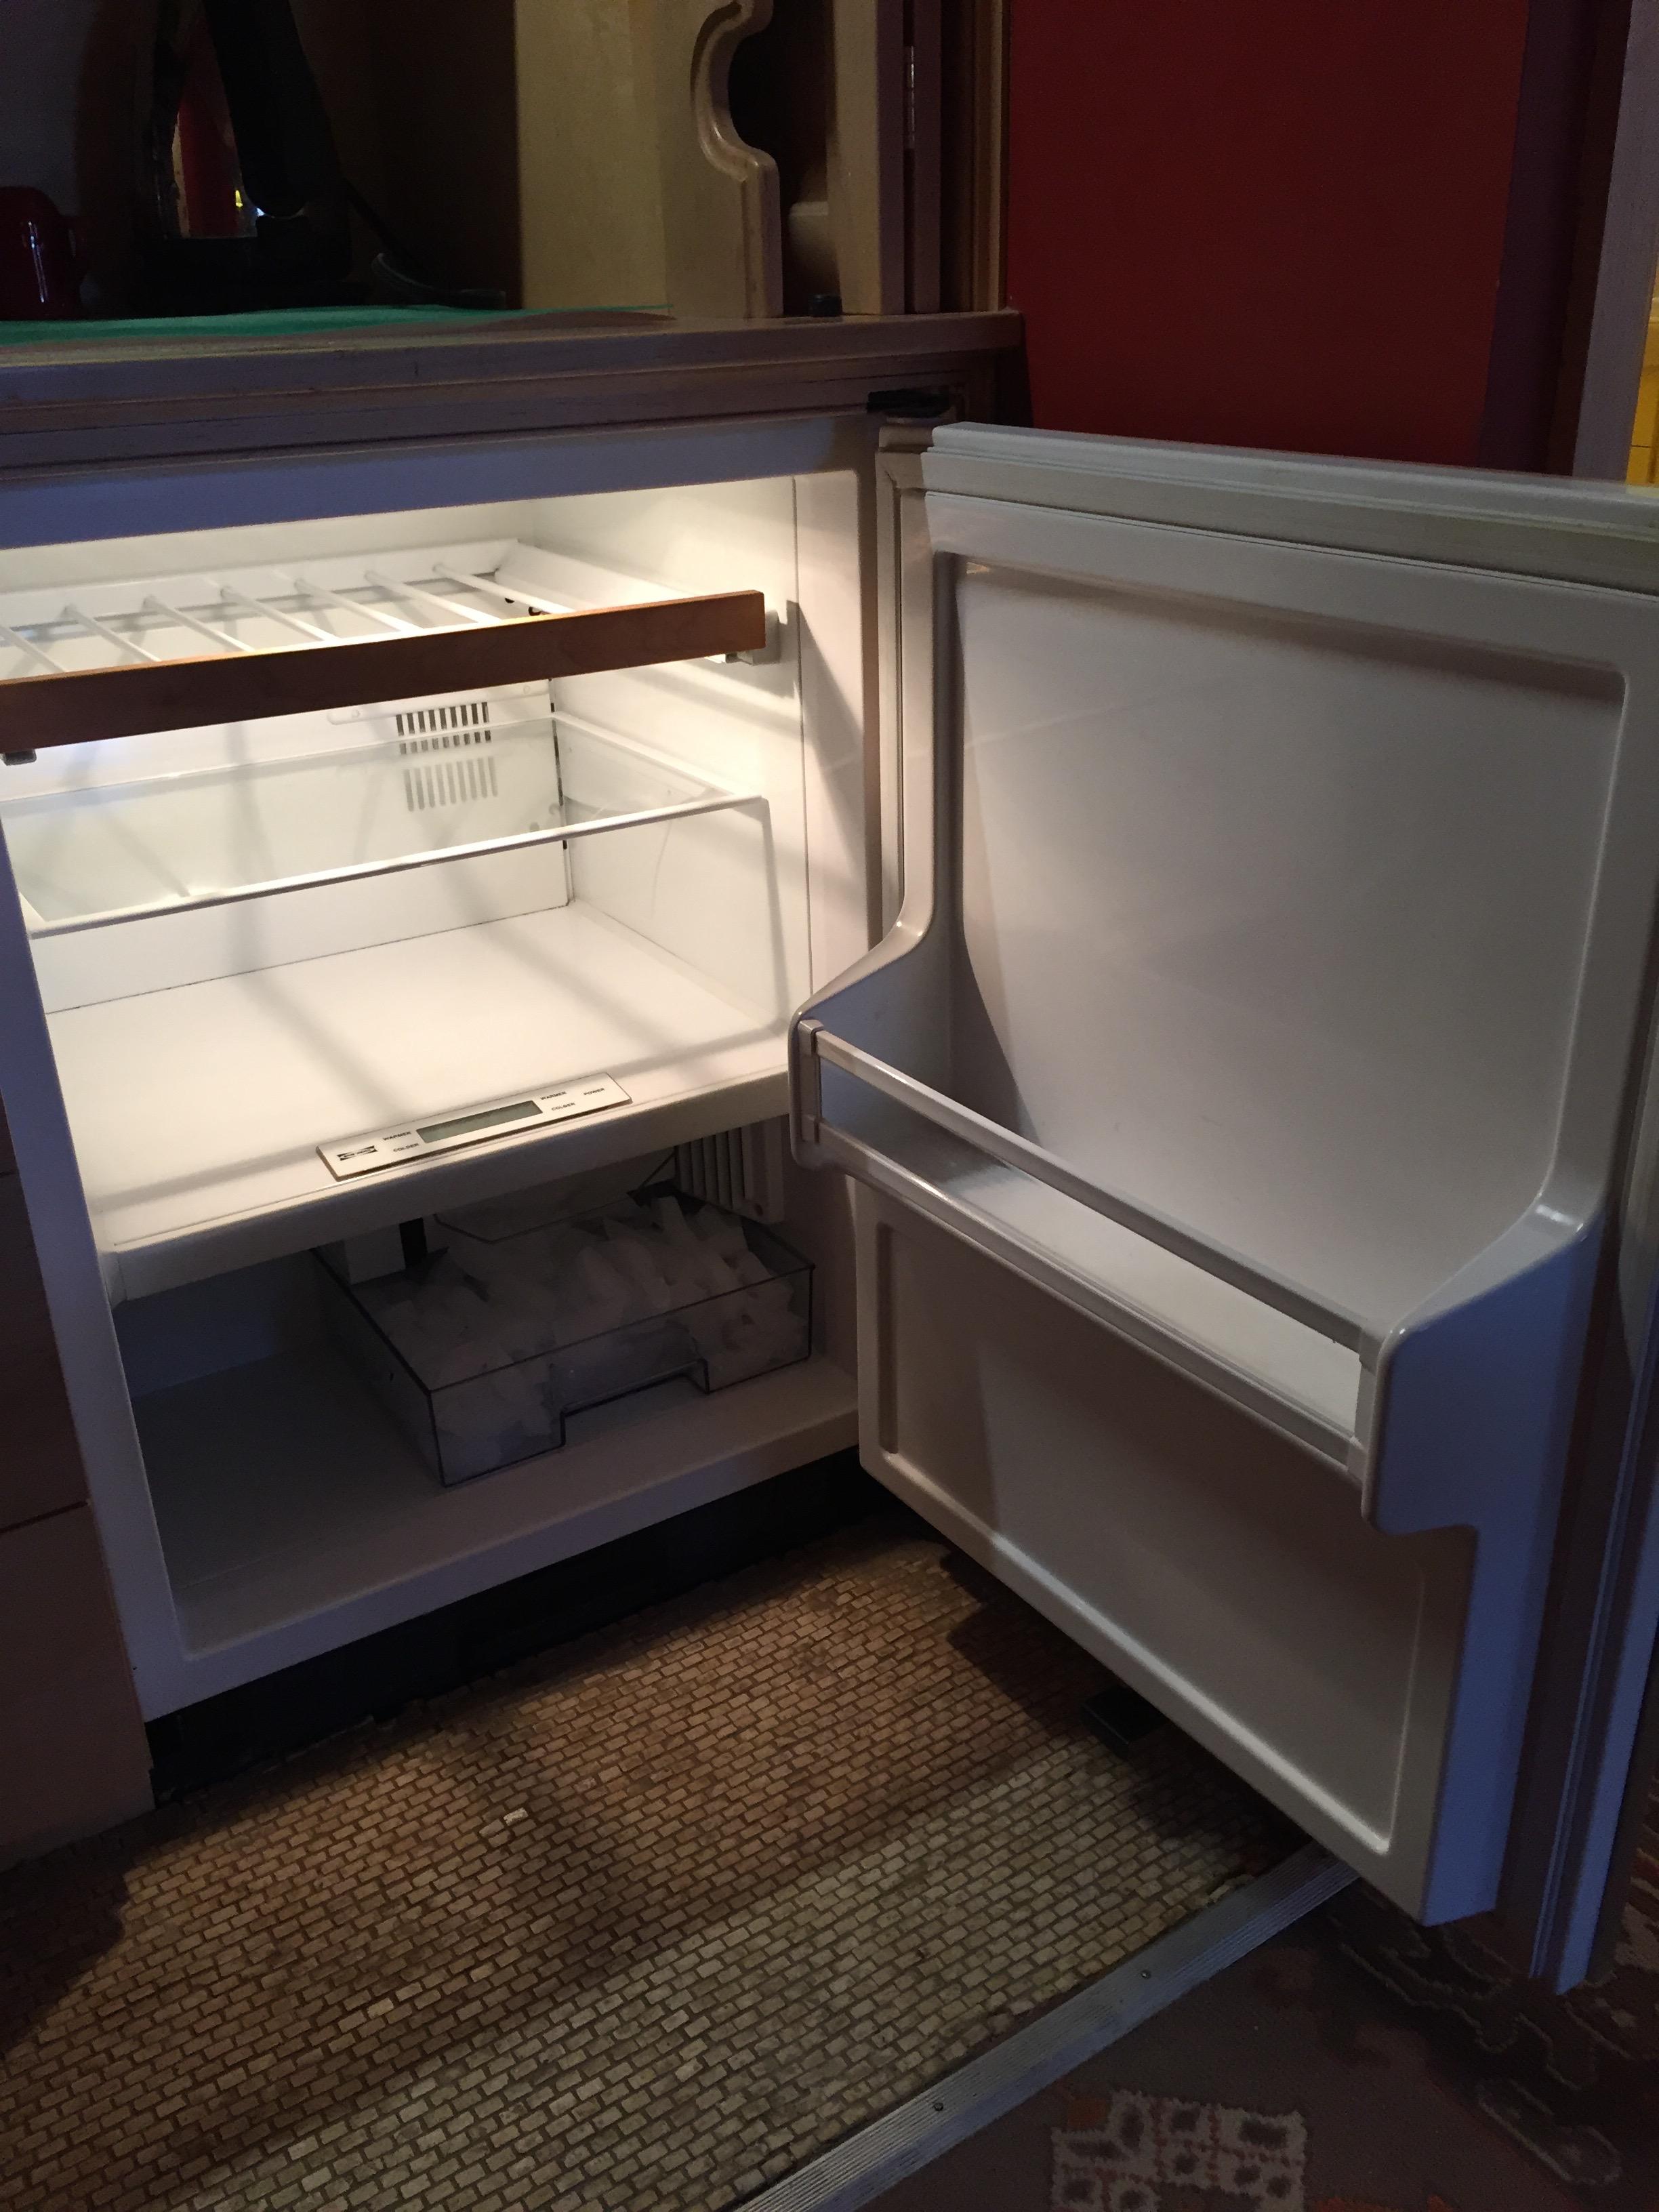 refridgerator freezer